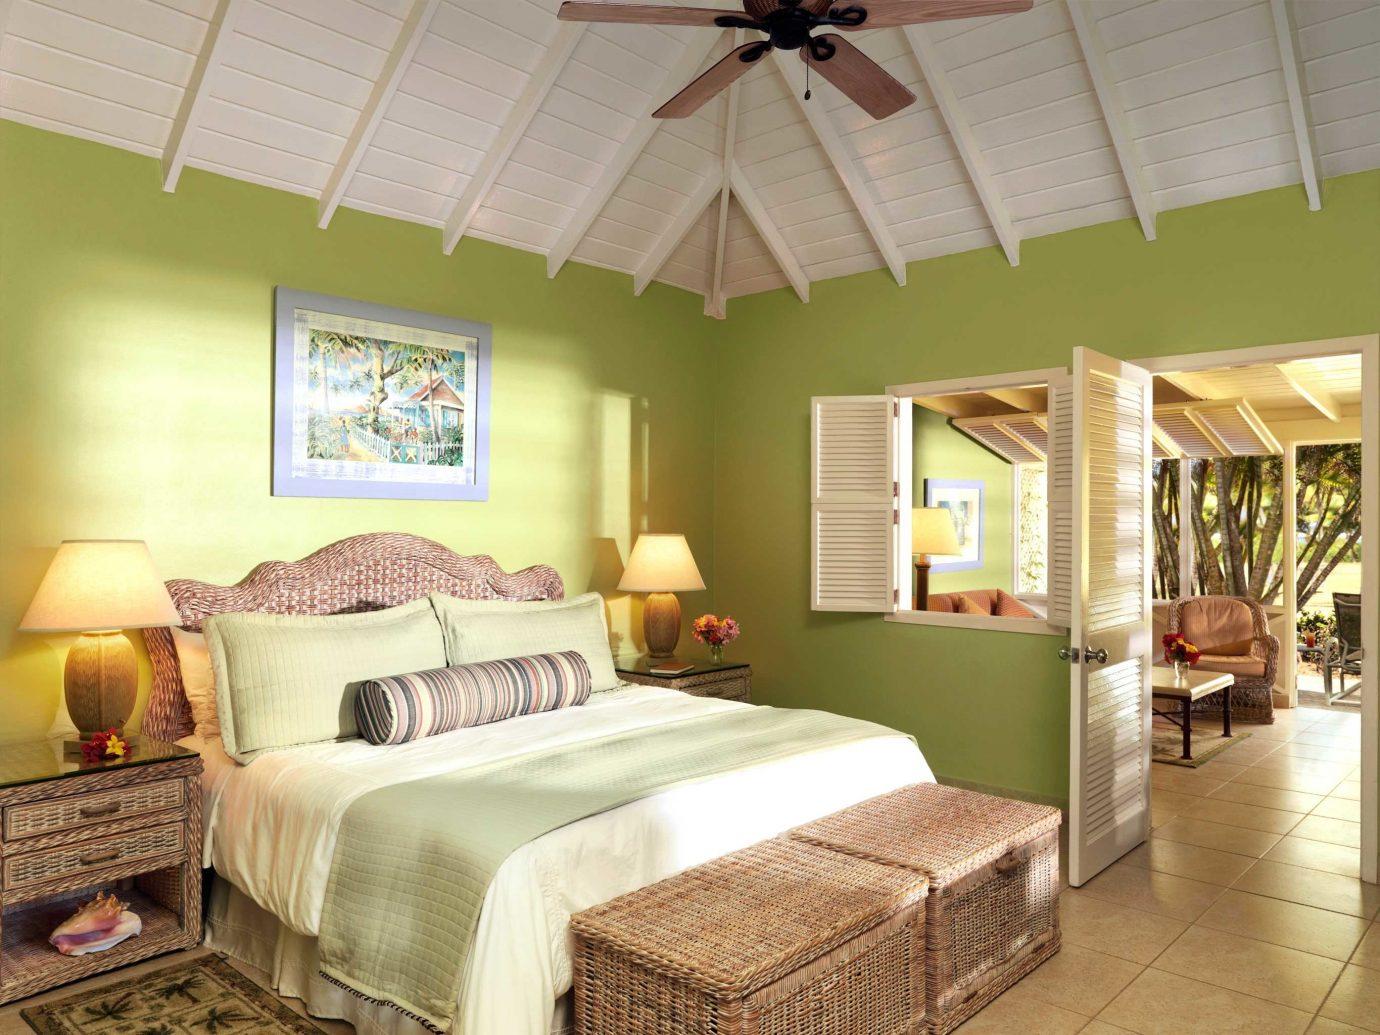 Balcony Beach Bedroom Hotels Islands Lounge Luxury Luxury Travel Suite Trip Ideas property home cottage living room farmhouse Villa Resort